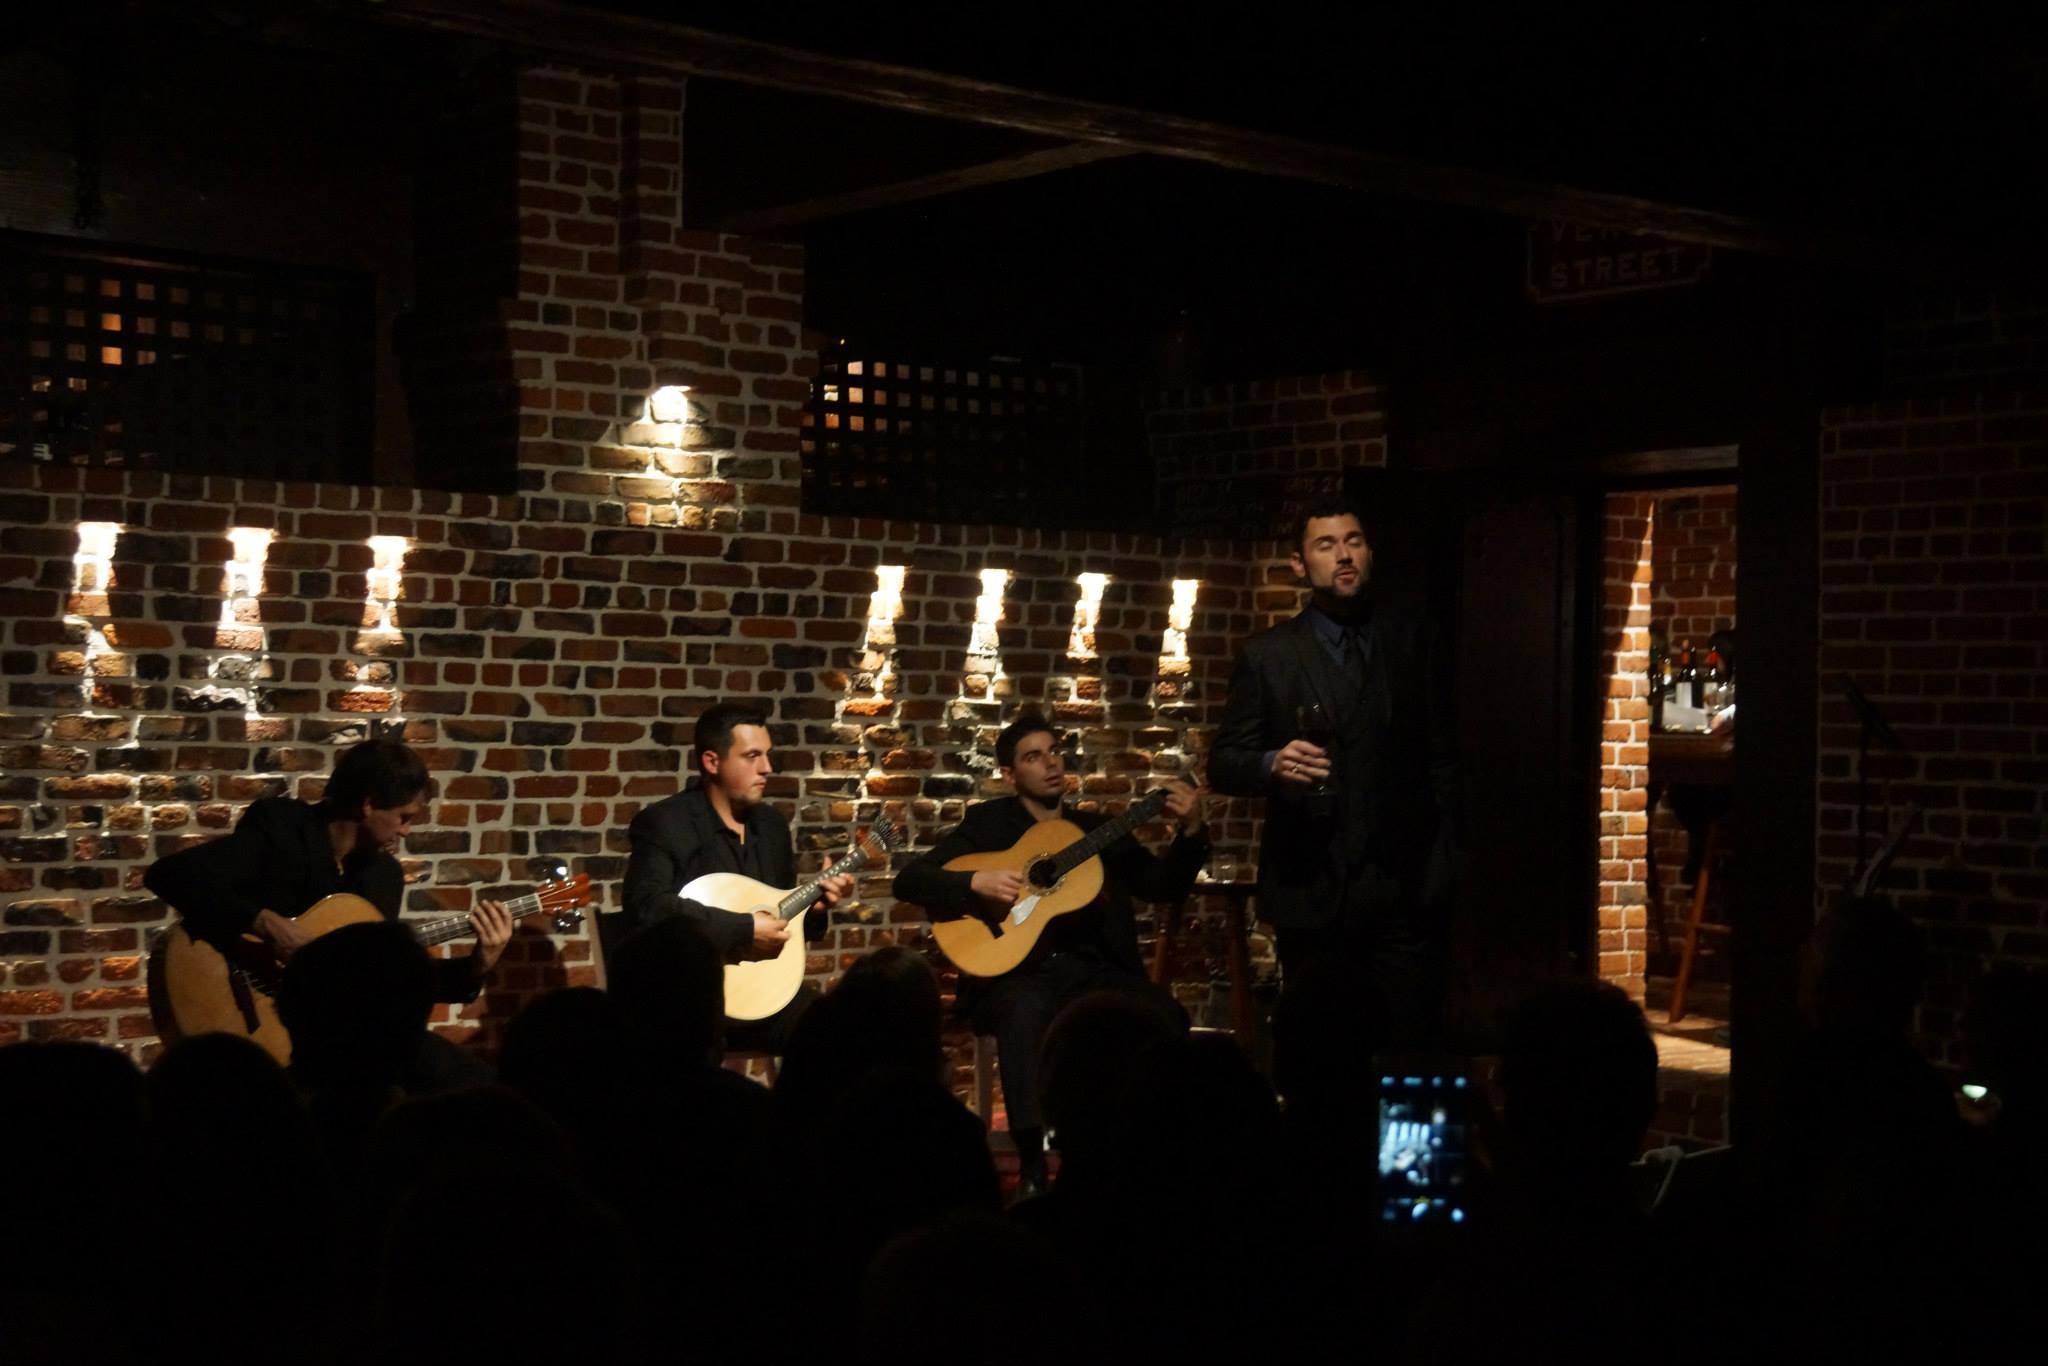 Fadista David Silveira Garcia  performing   at The Pines.